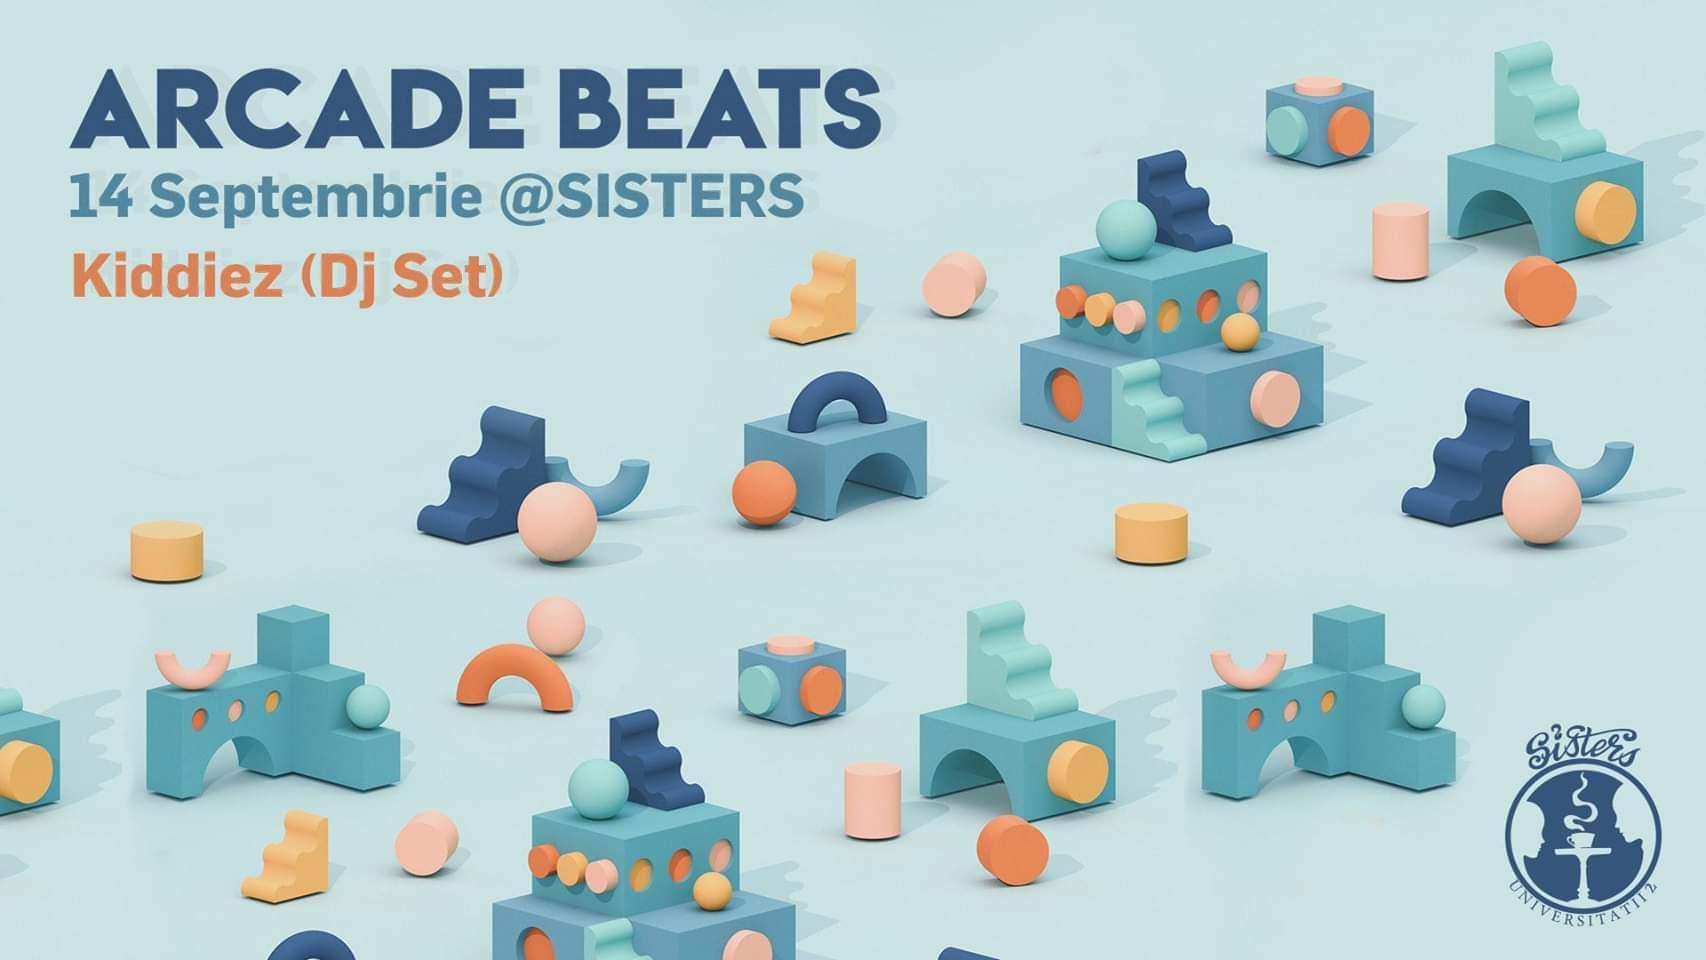 Arcade Beats with Kiddiez @ Sisters